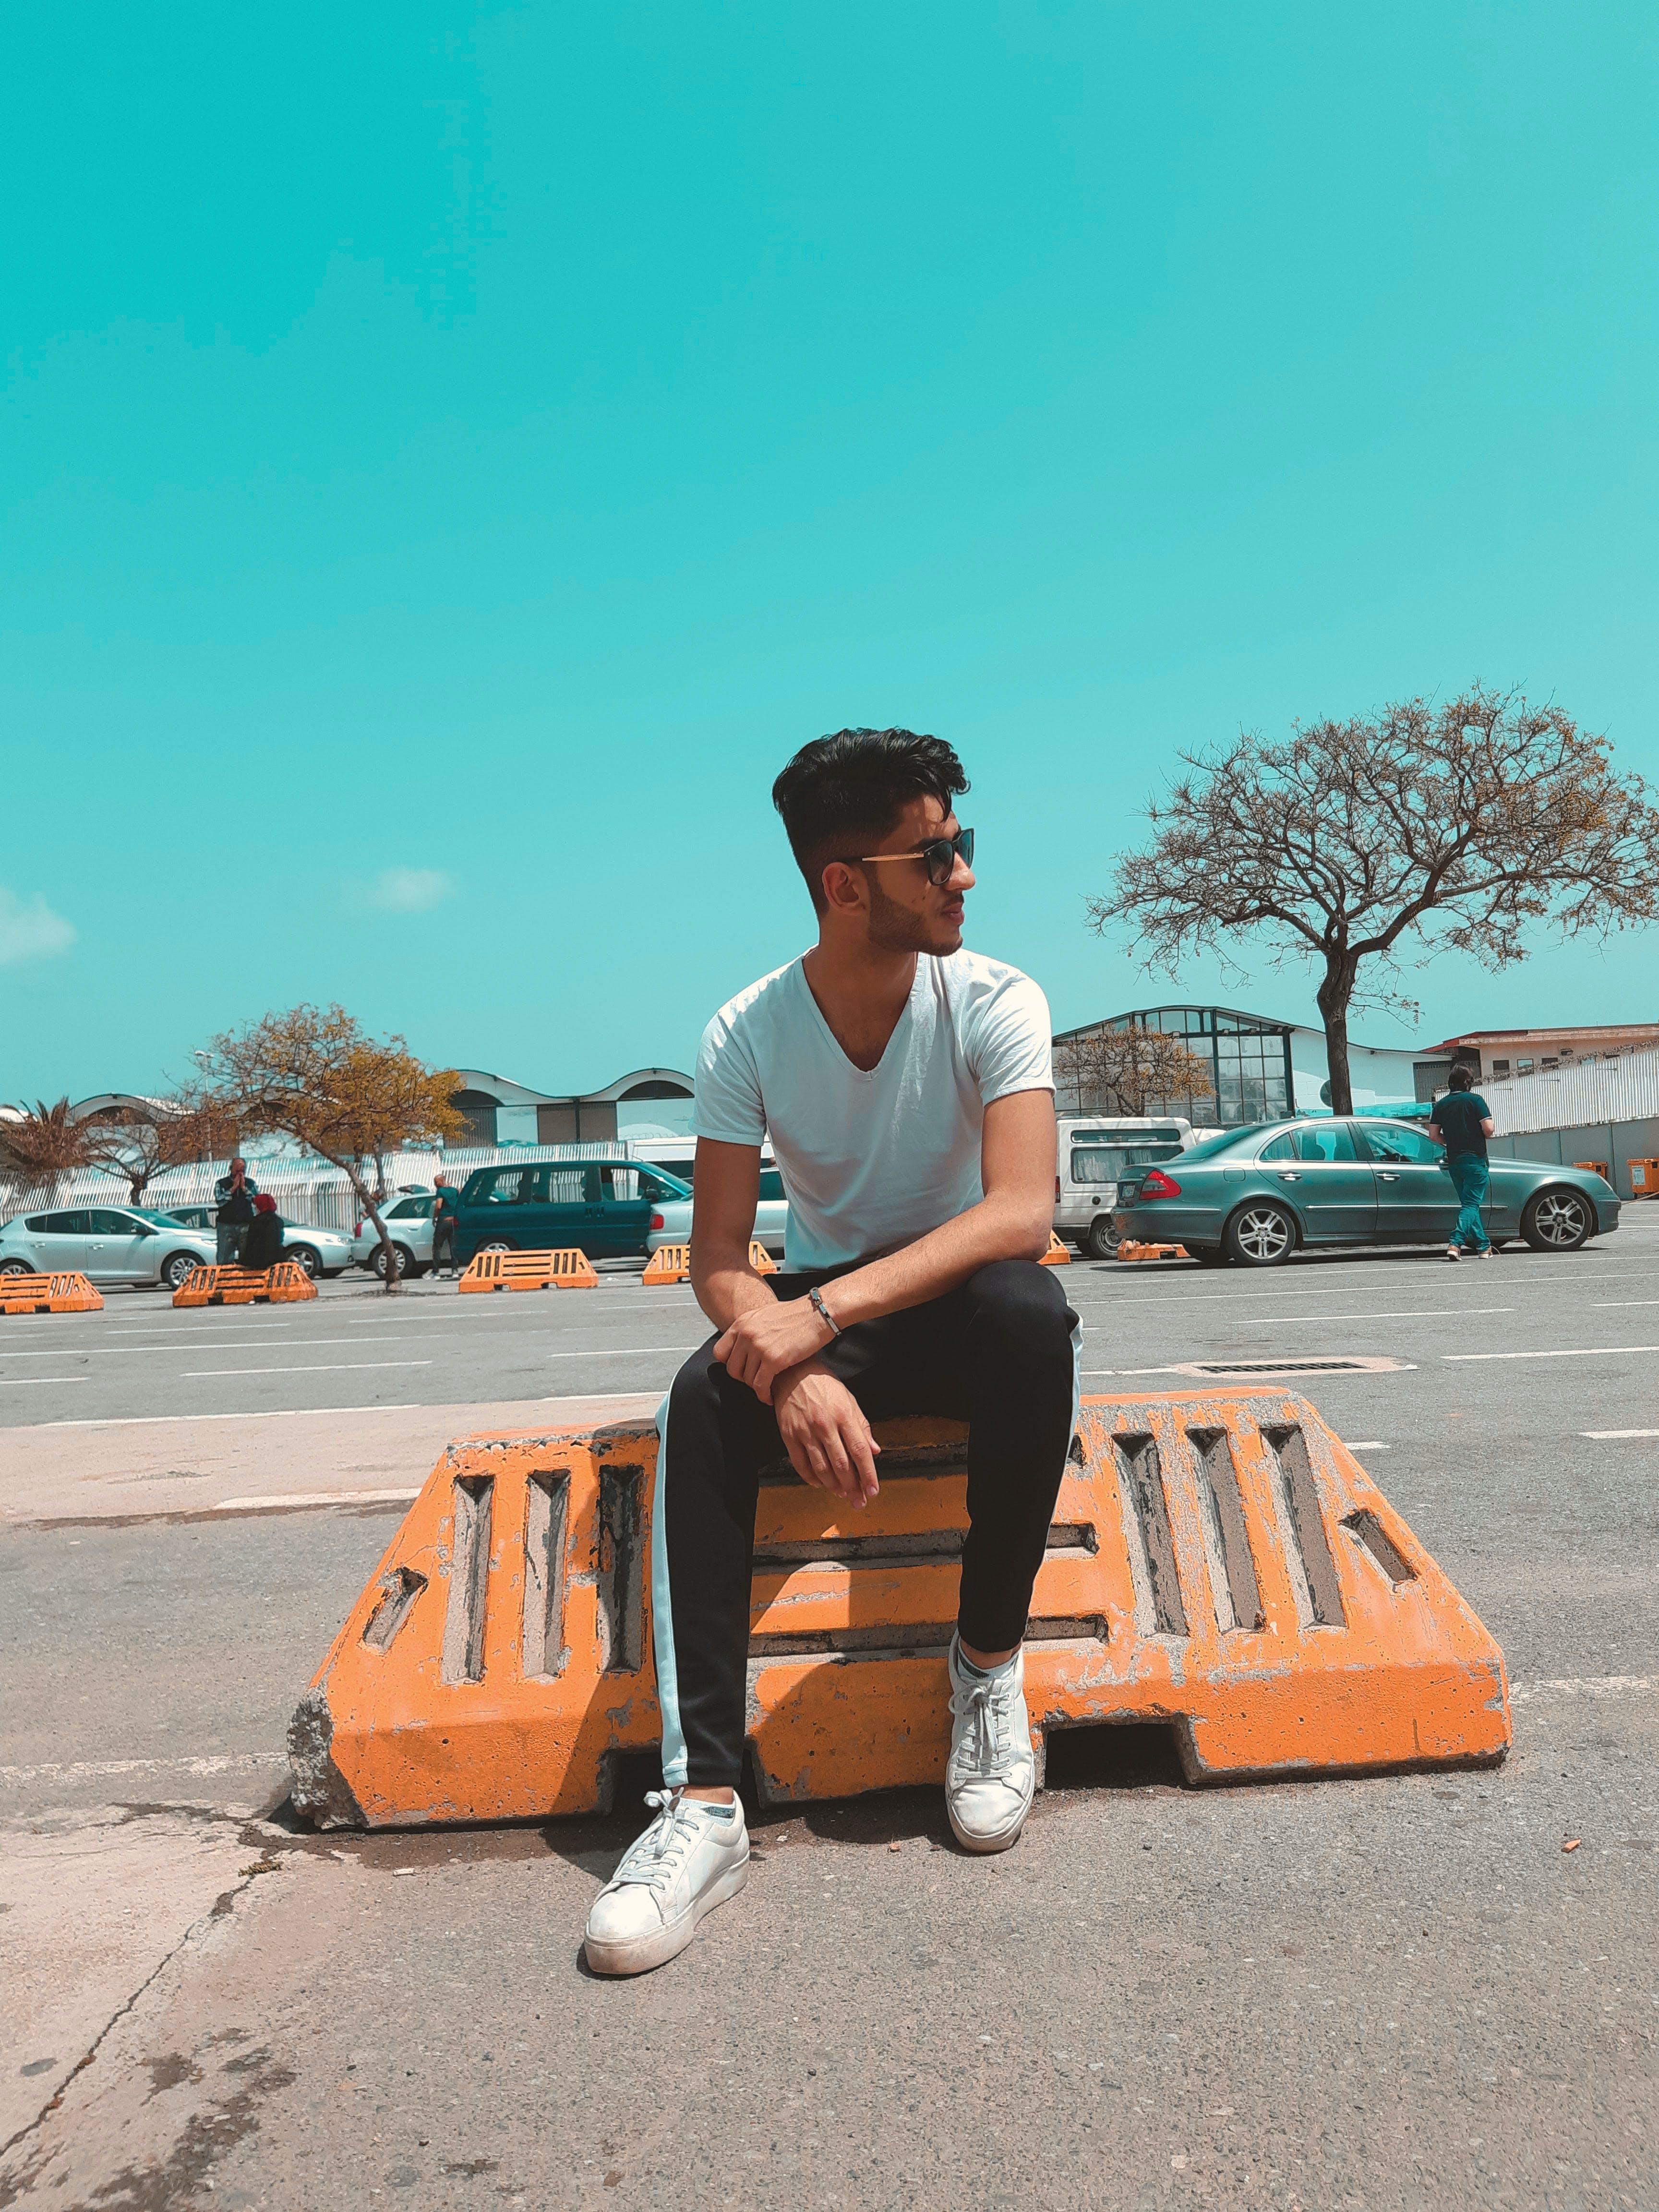 Man In White Shirt Sitting On Orange Concrete